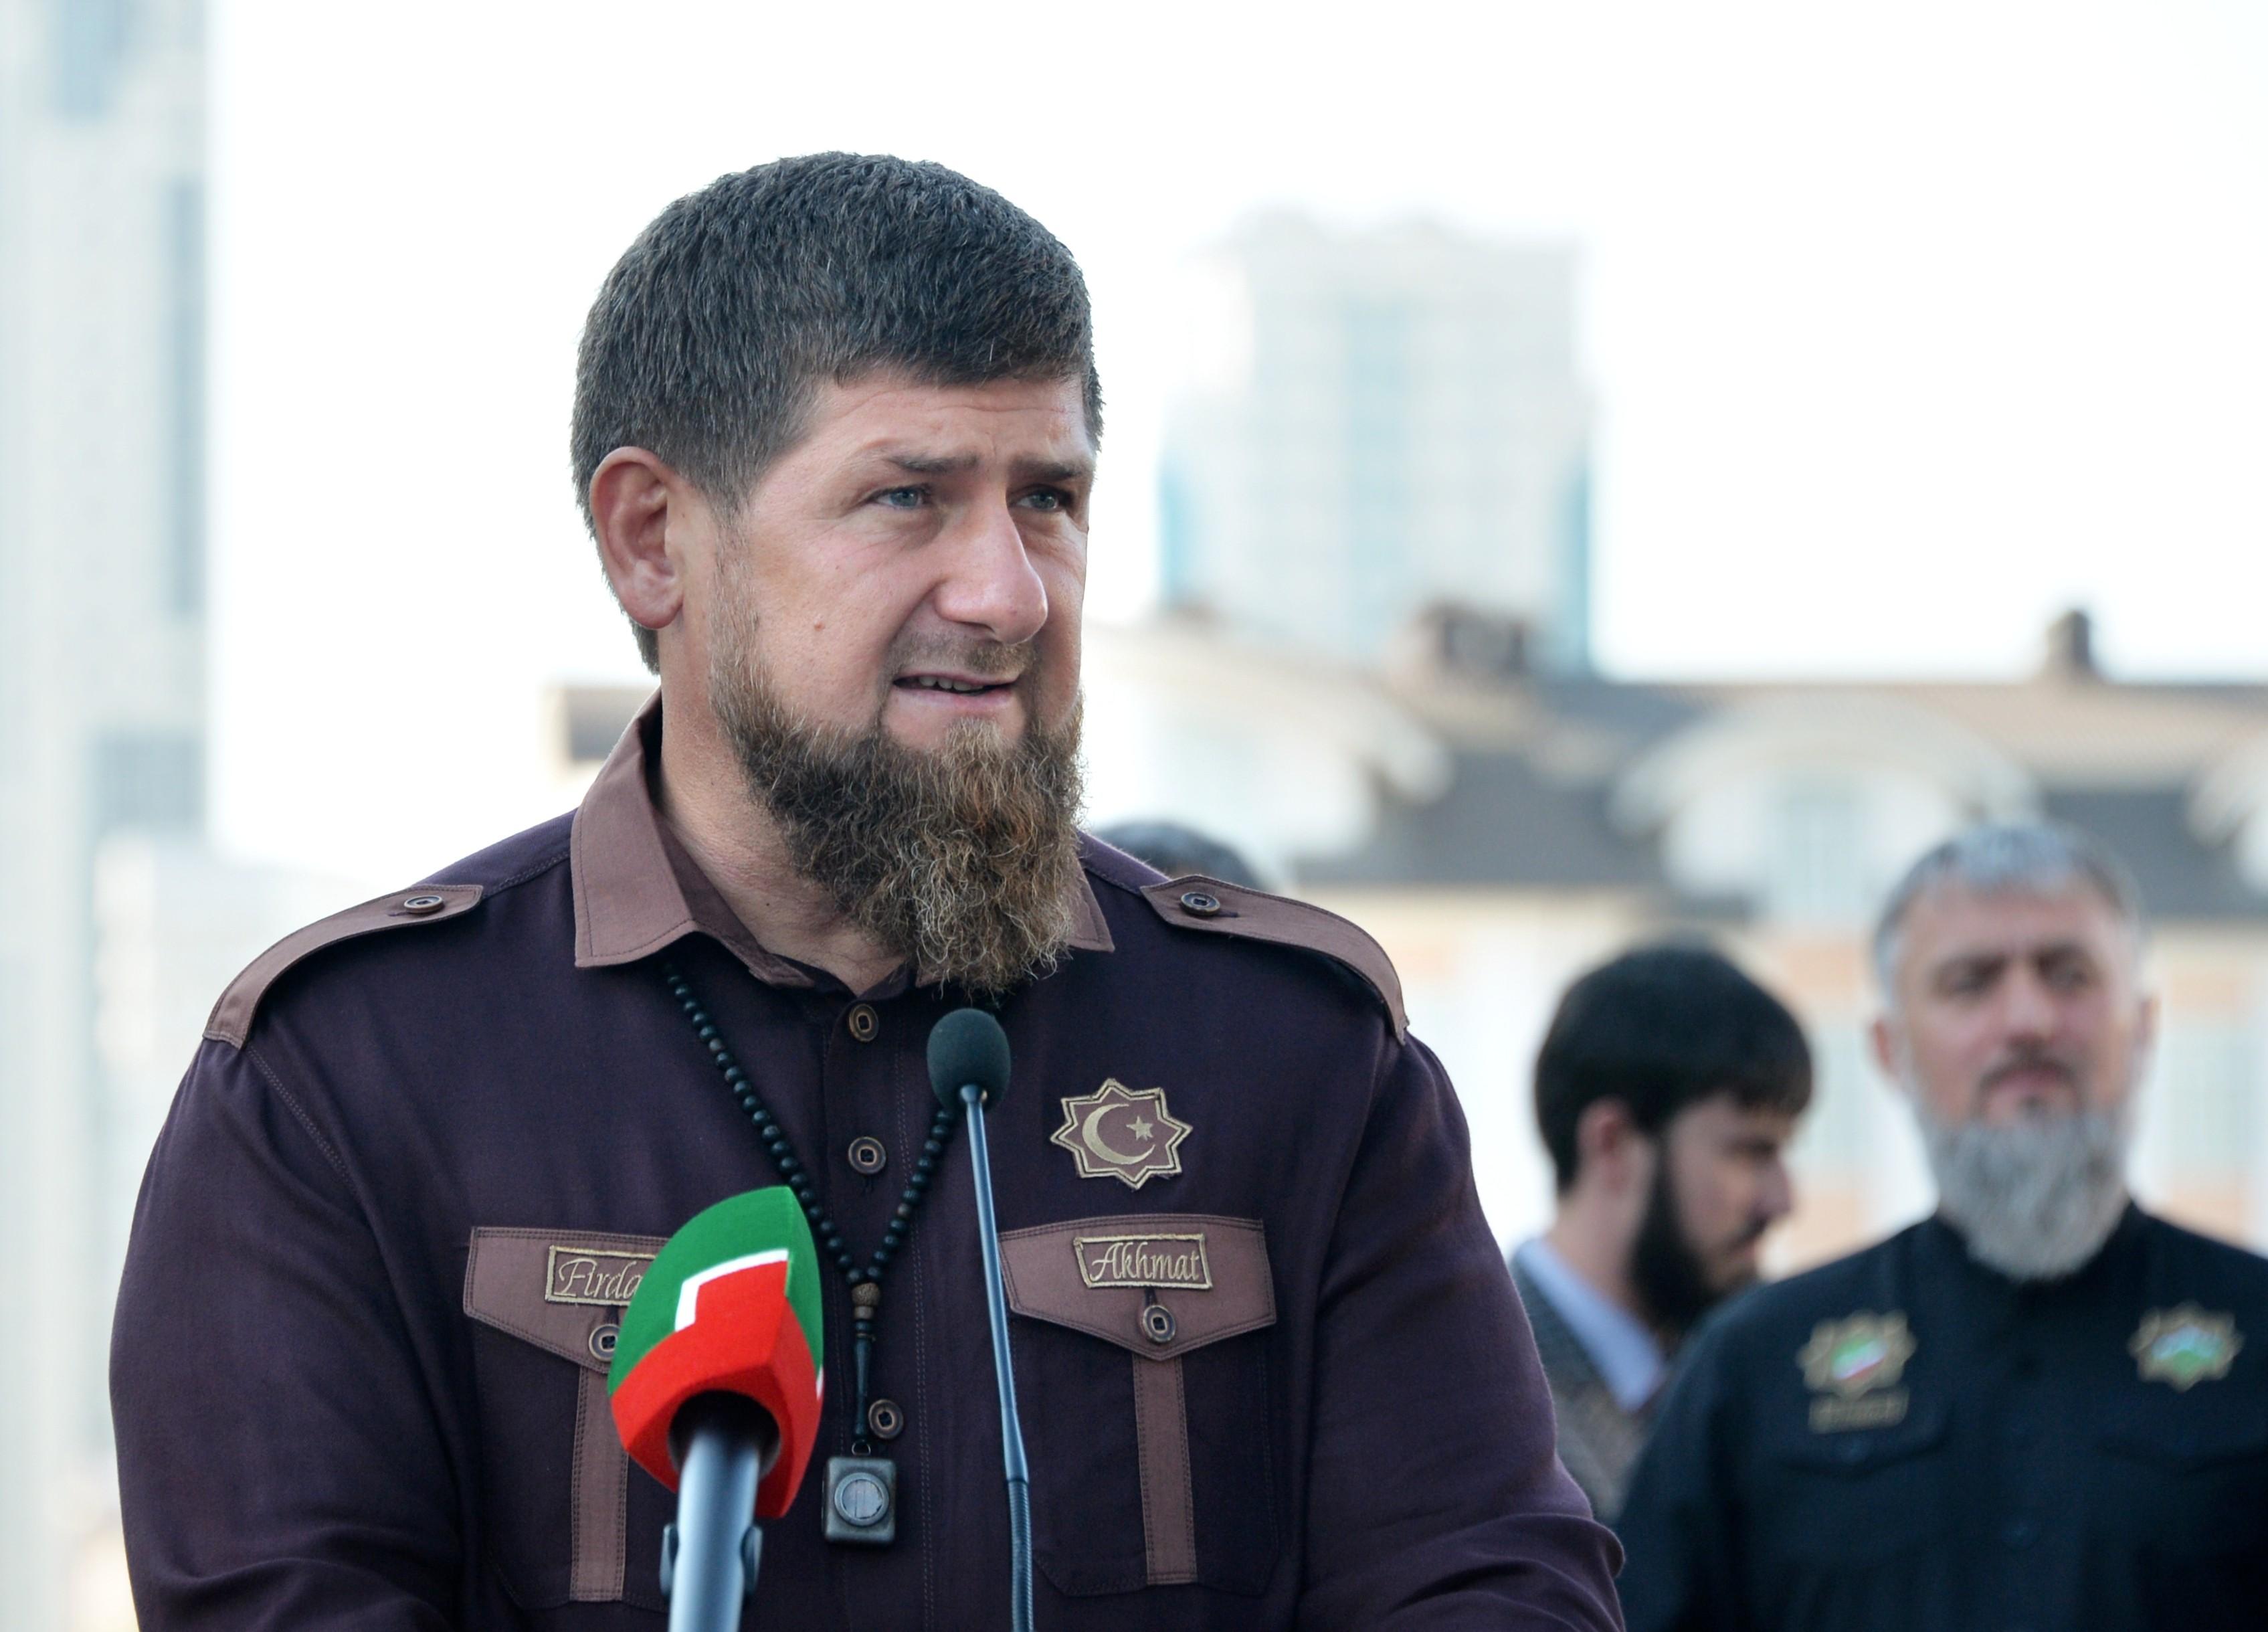 <p>Рамзан Кадыров. Фото: &copy;РИА Новости/Саид Царнаев</p>